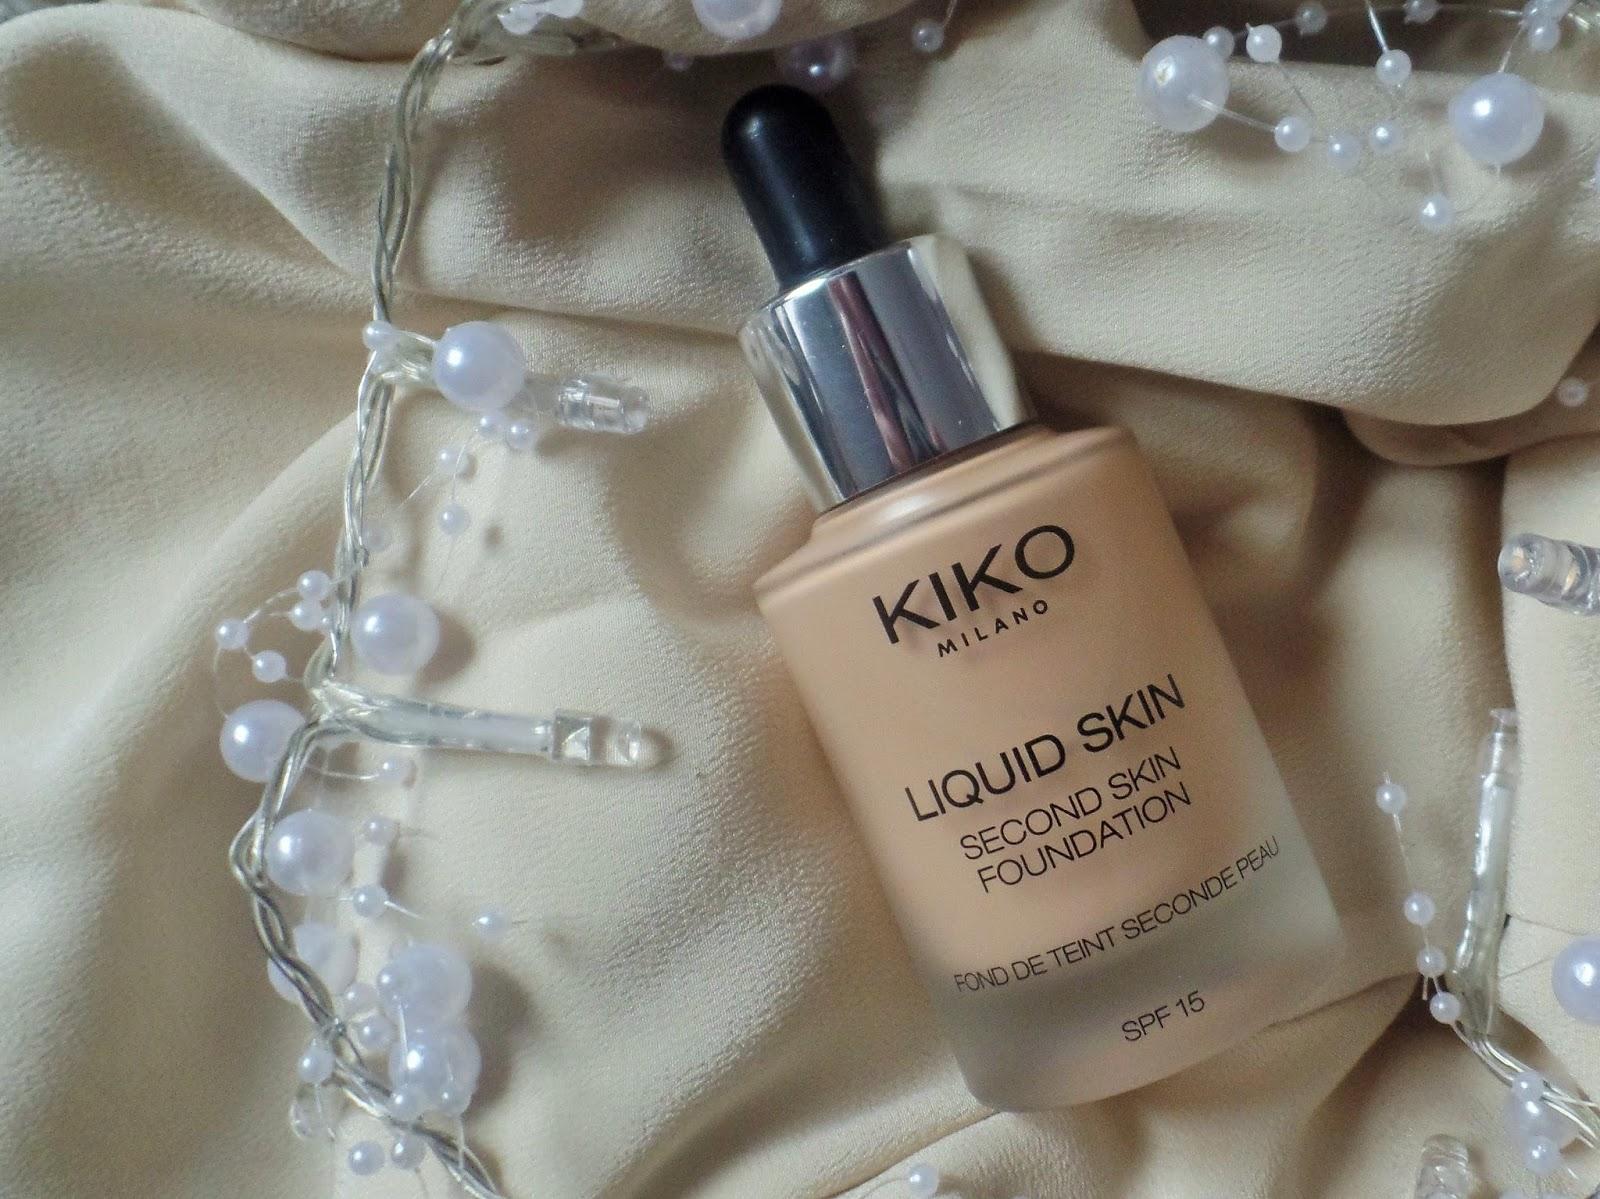 fond de teint kiko peau grasse